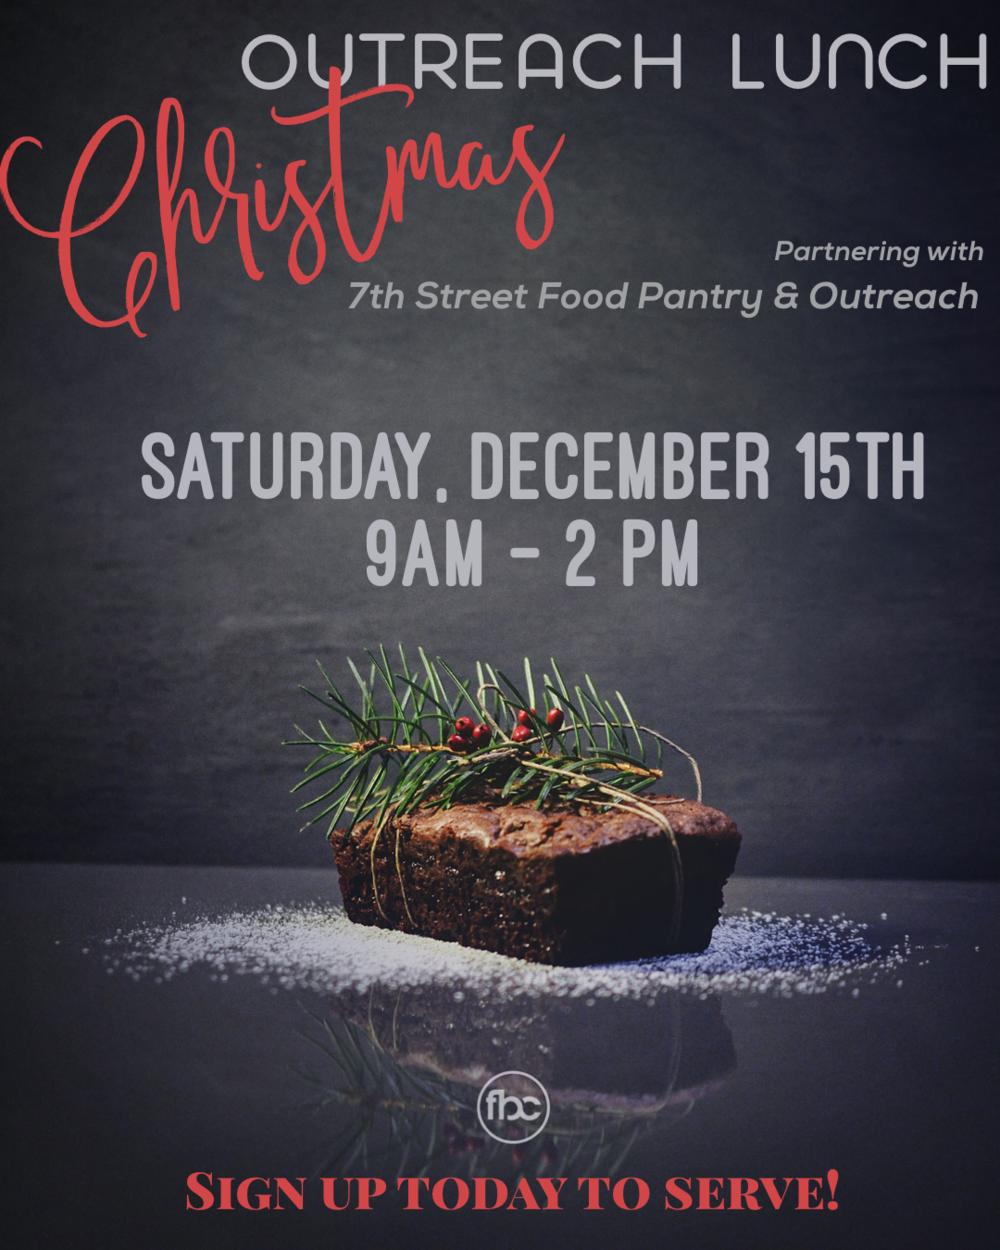 Christmas Outreach - Sunday, December 2nd 10:30 am Service